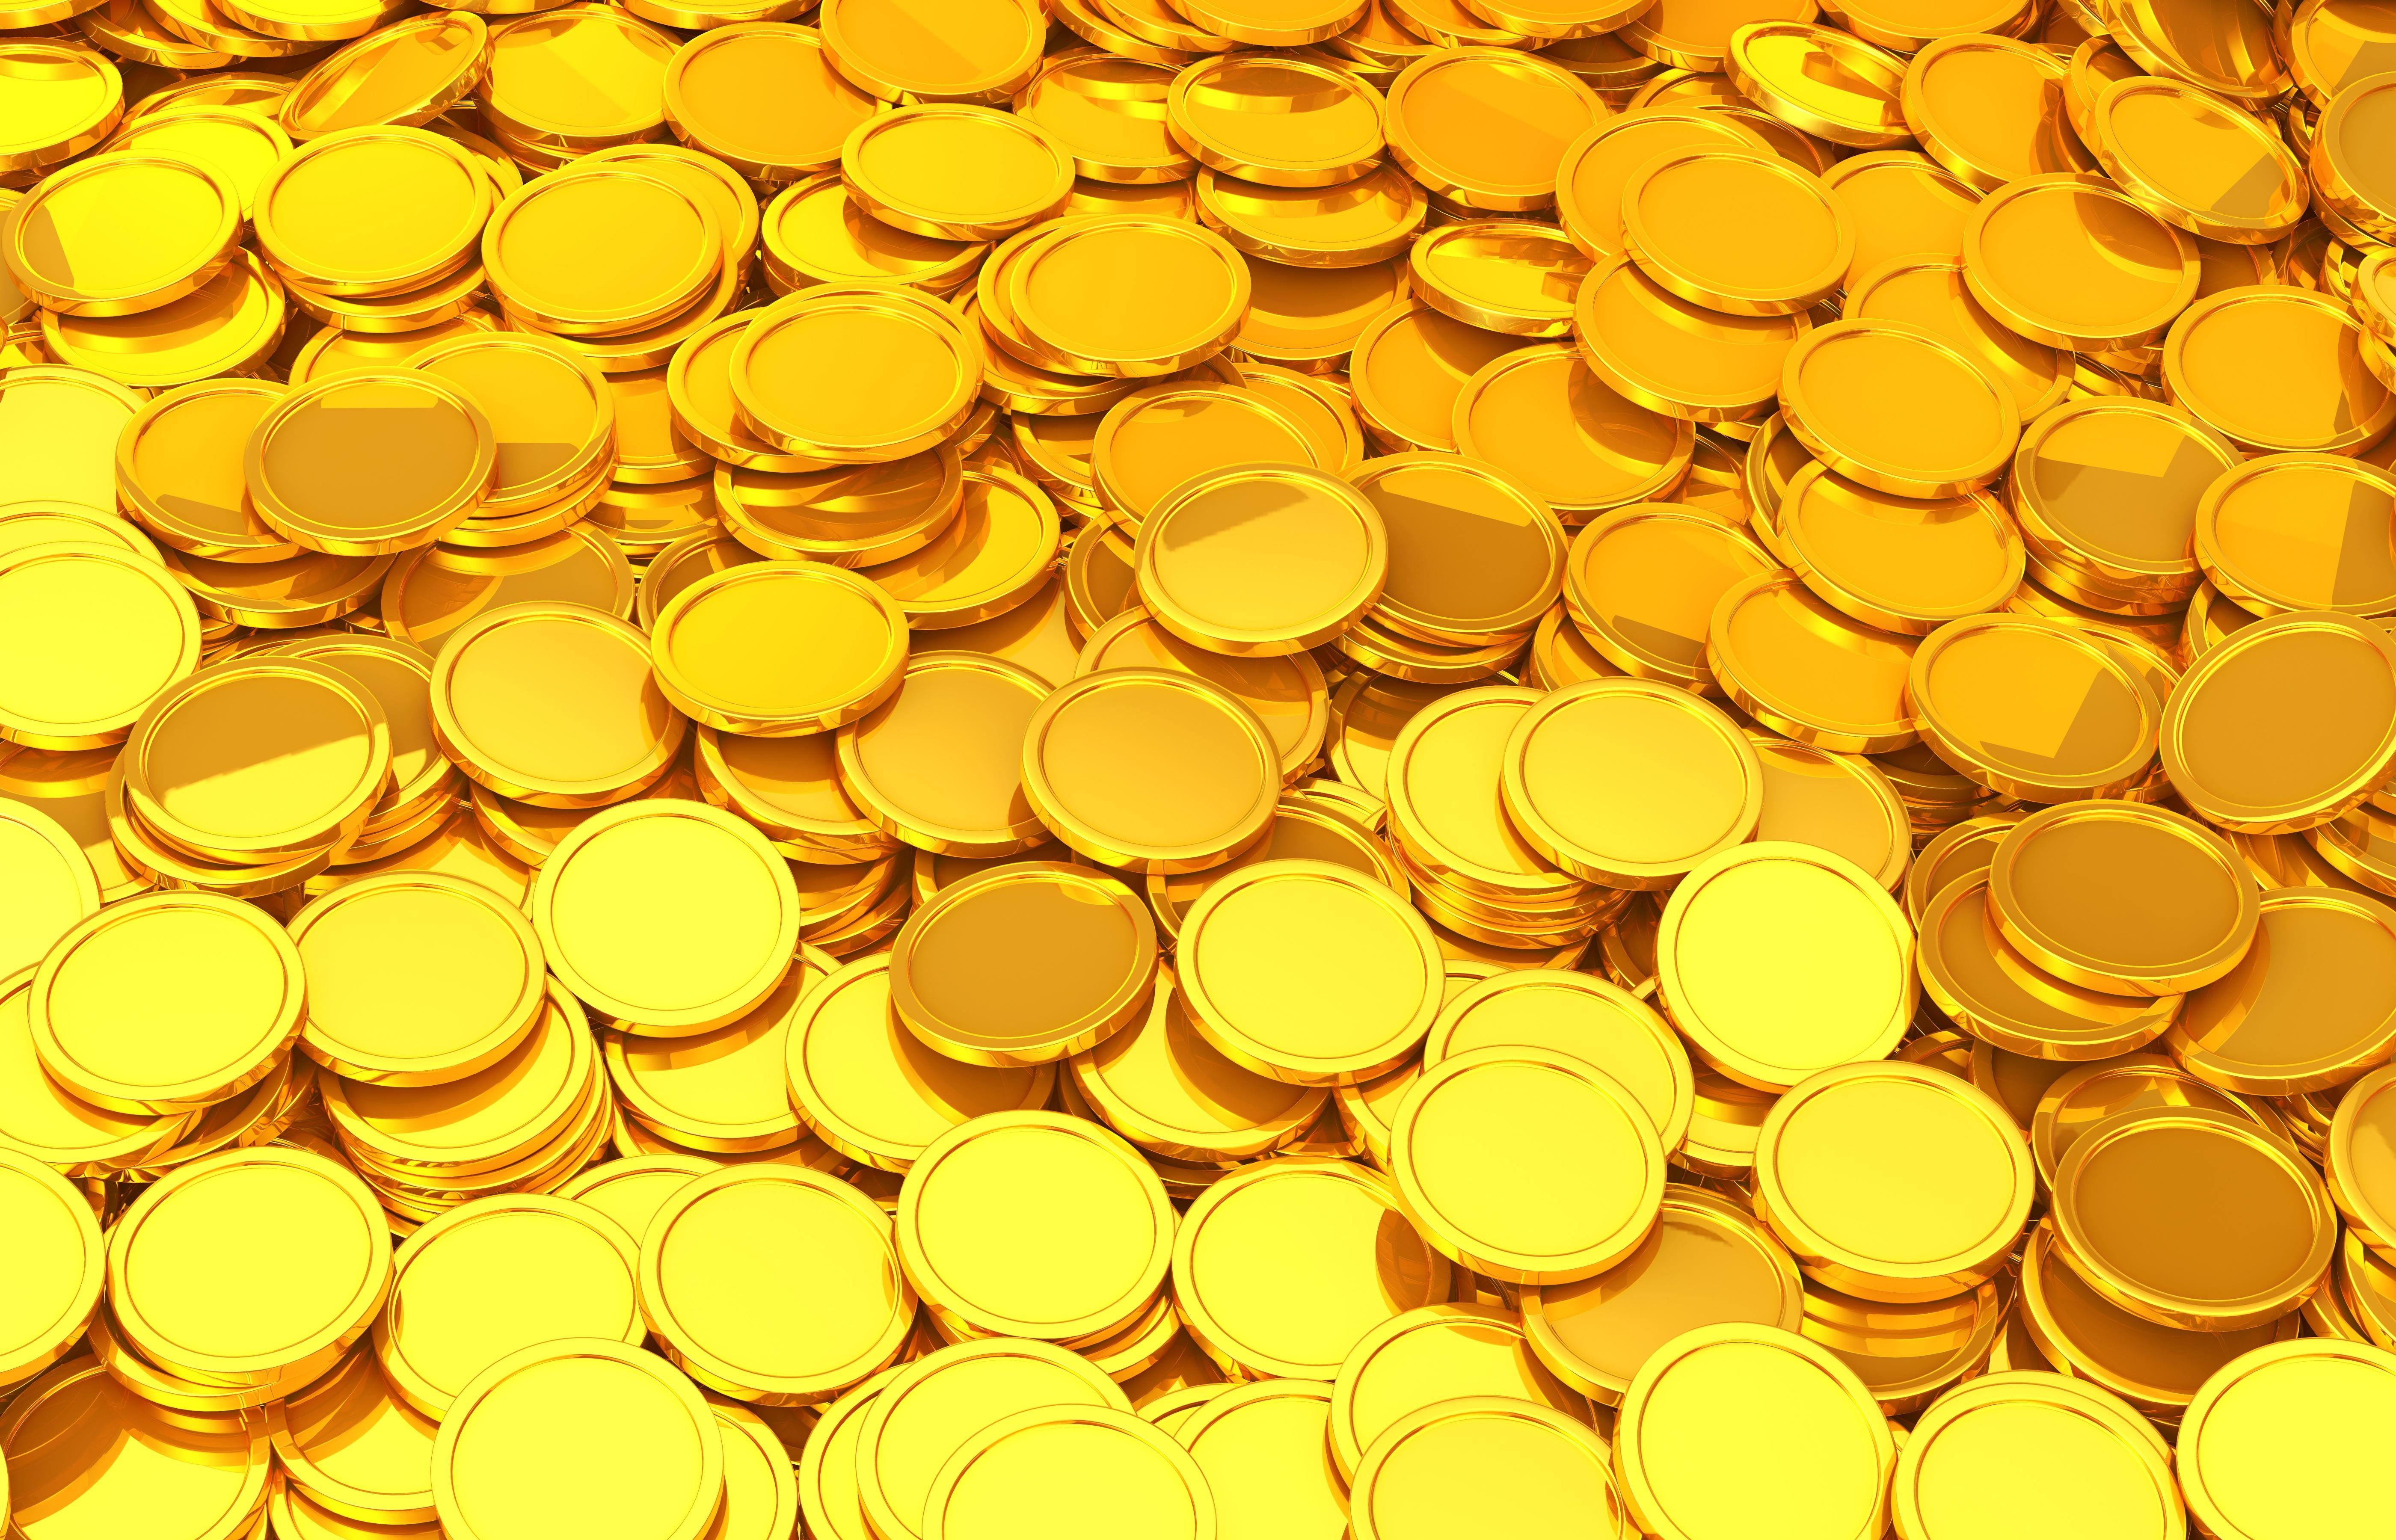 21719314 - gold coin